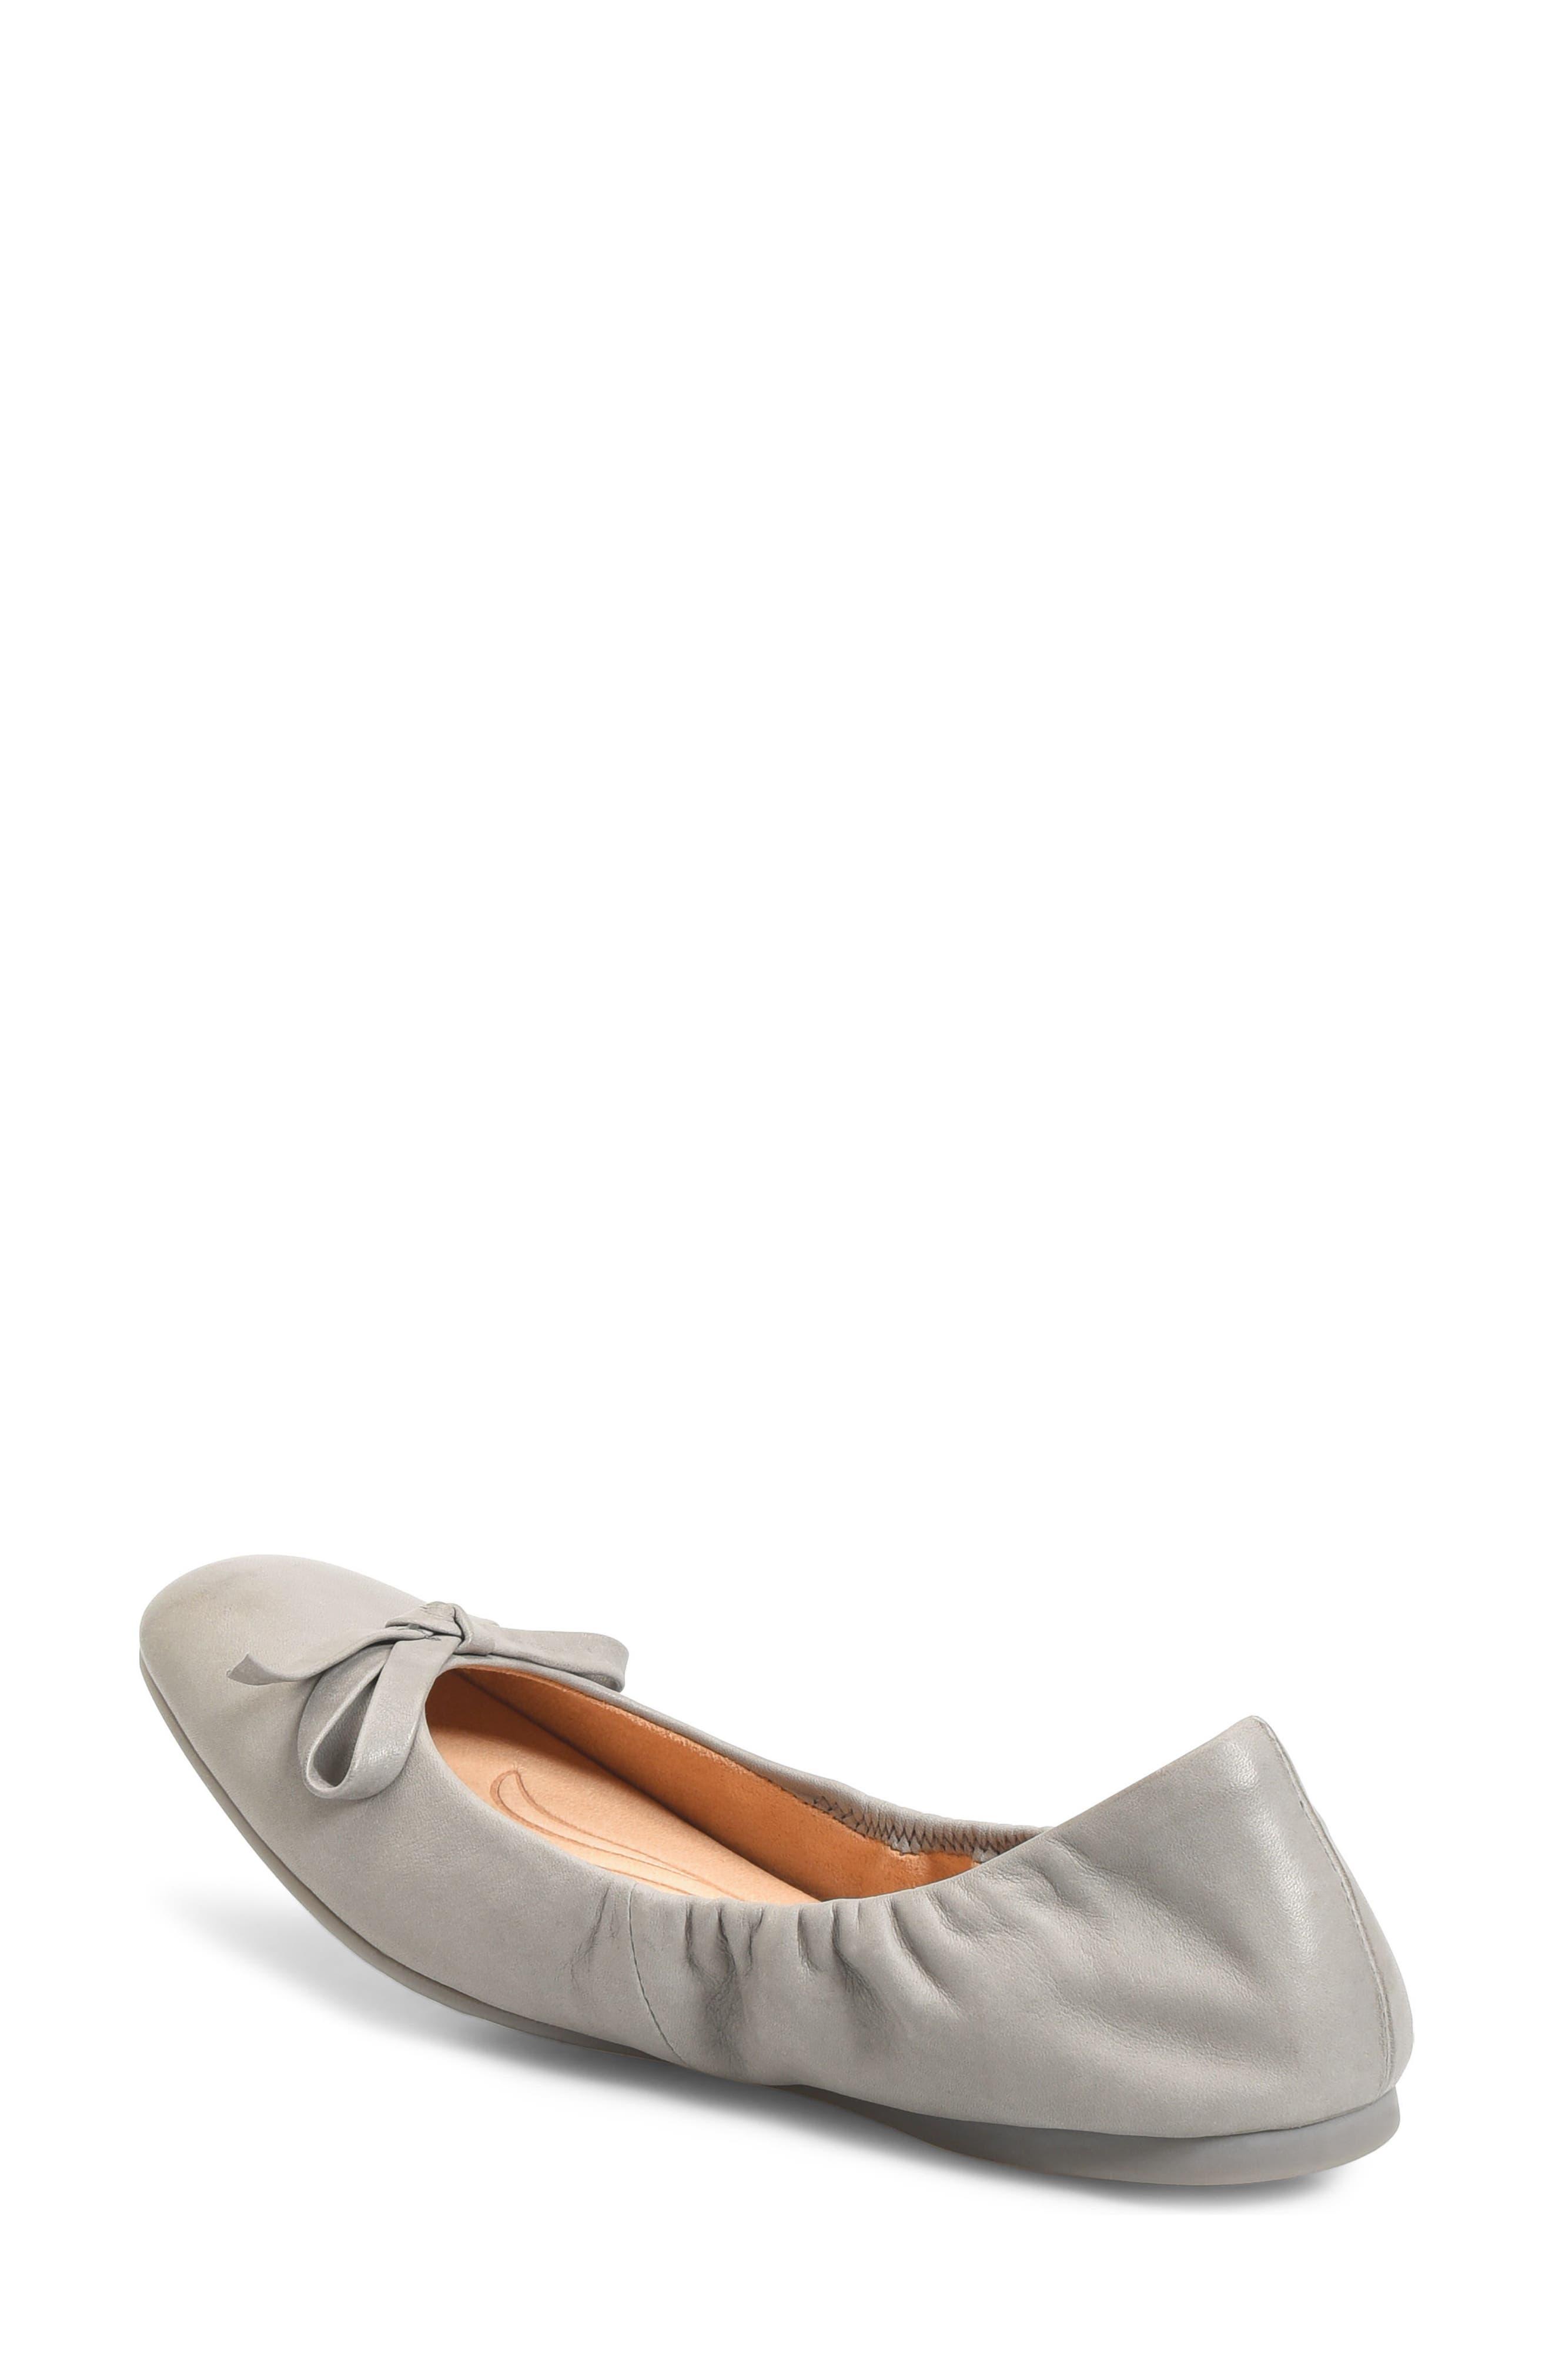 Karoline Ballet Flat,                             Alternate thumbnail 2, color,                             Grey Leather